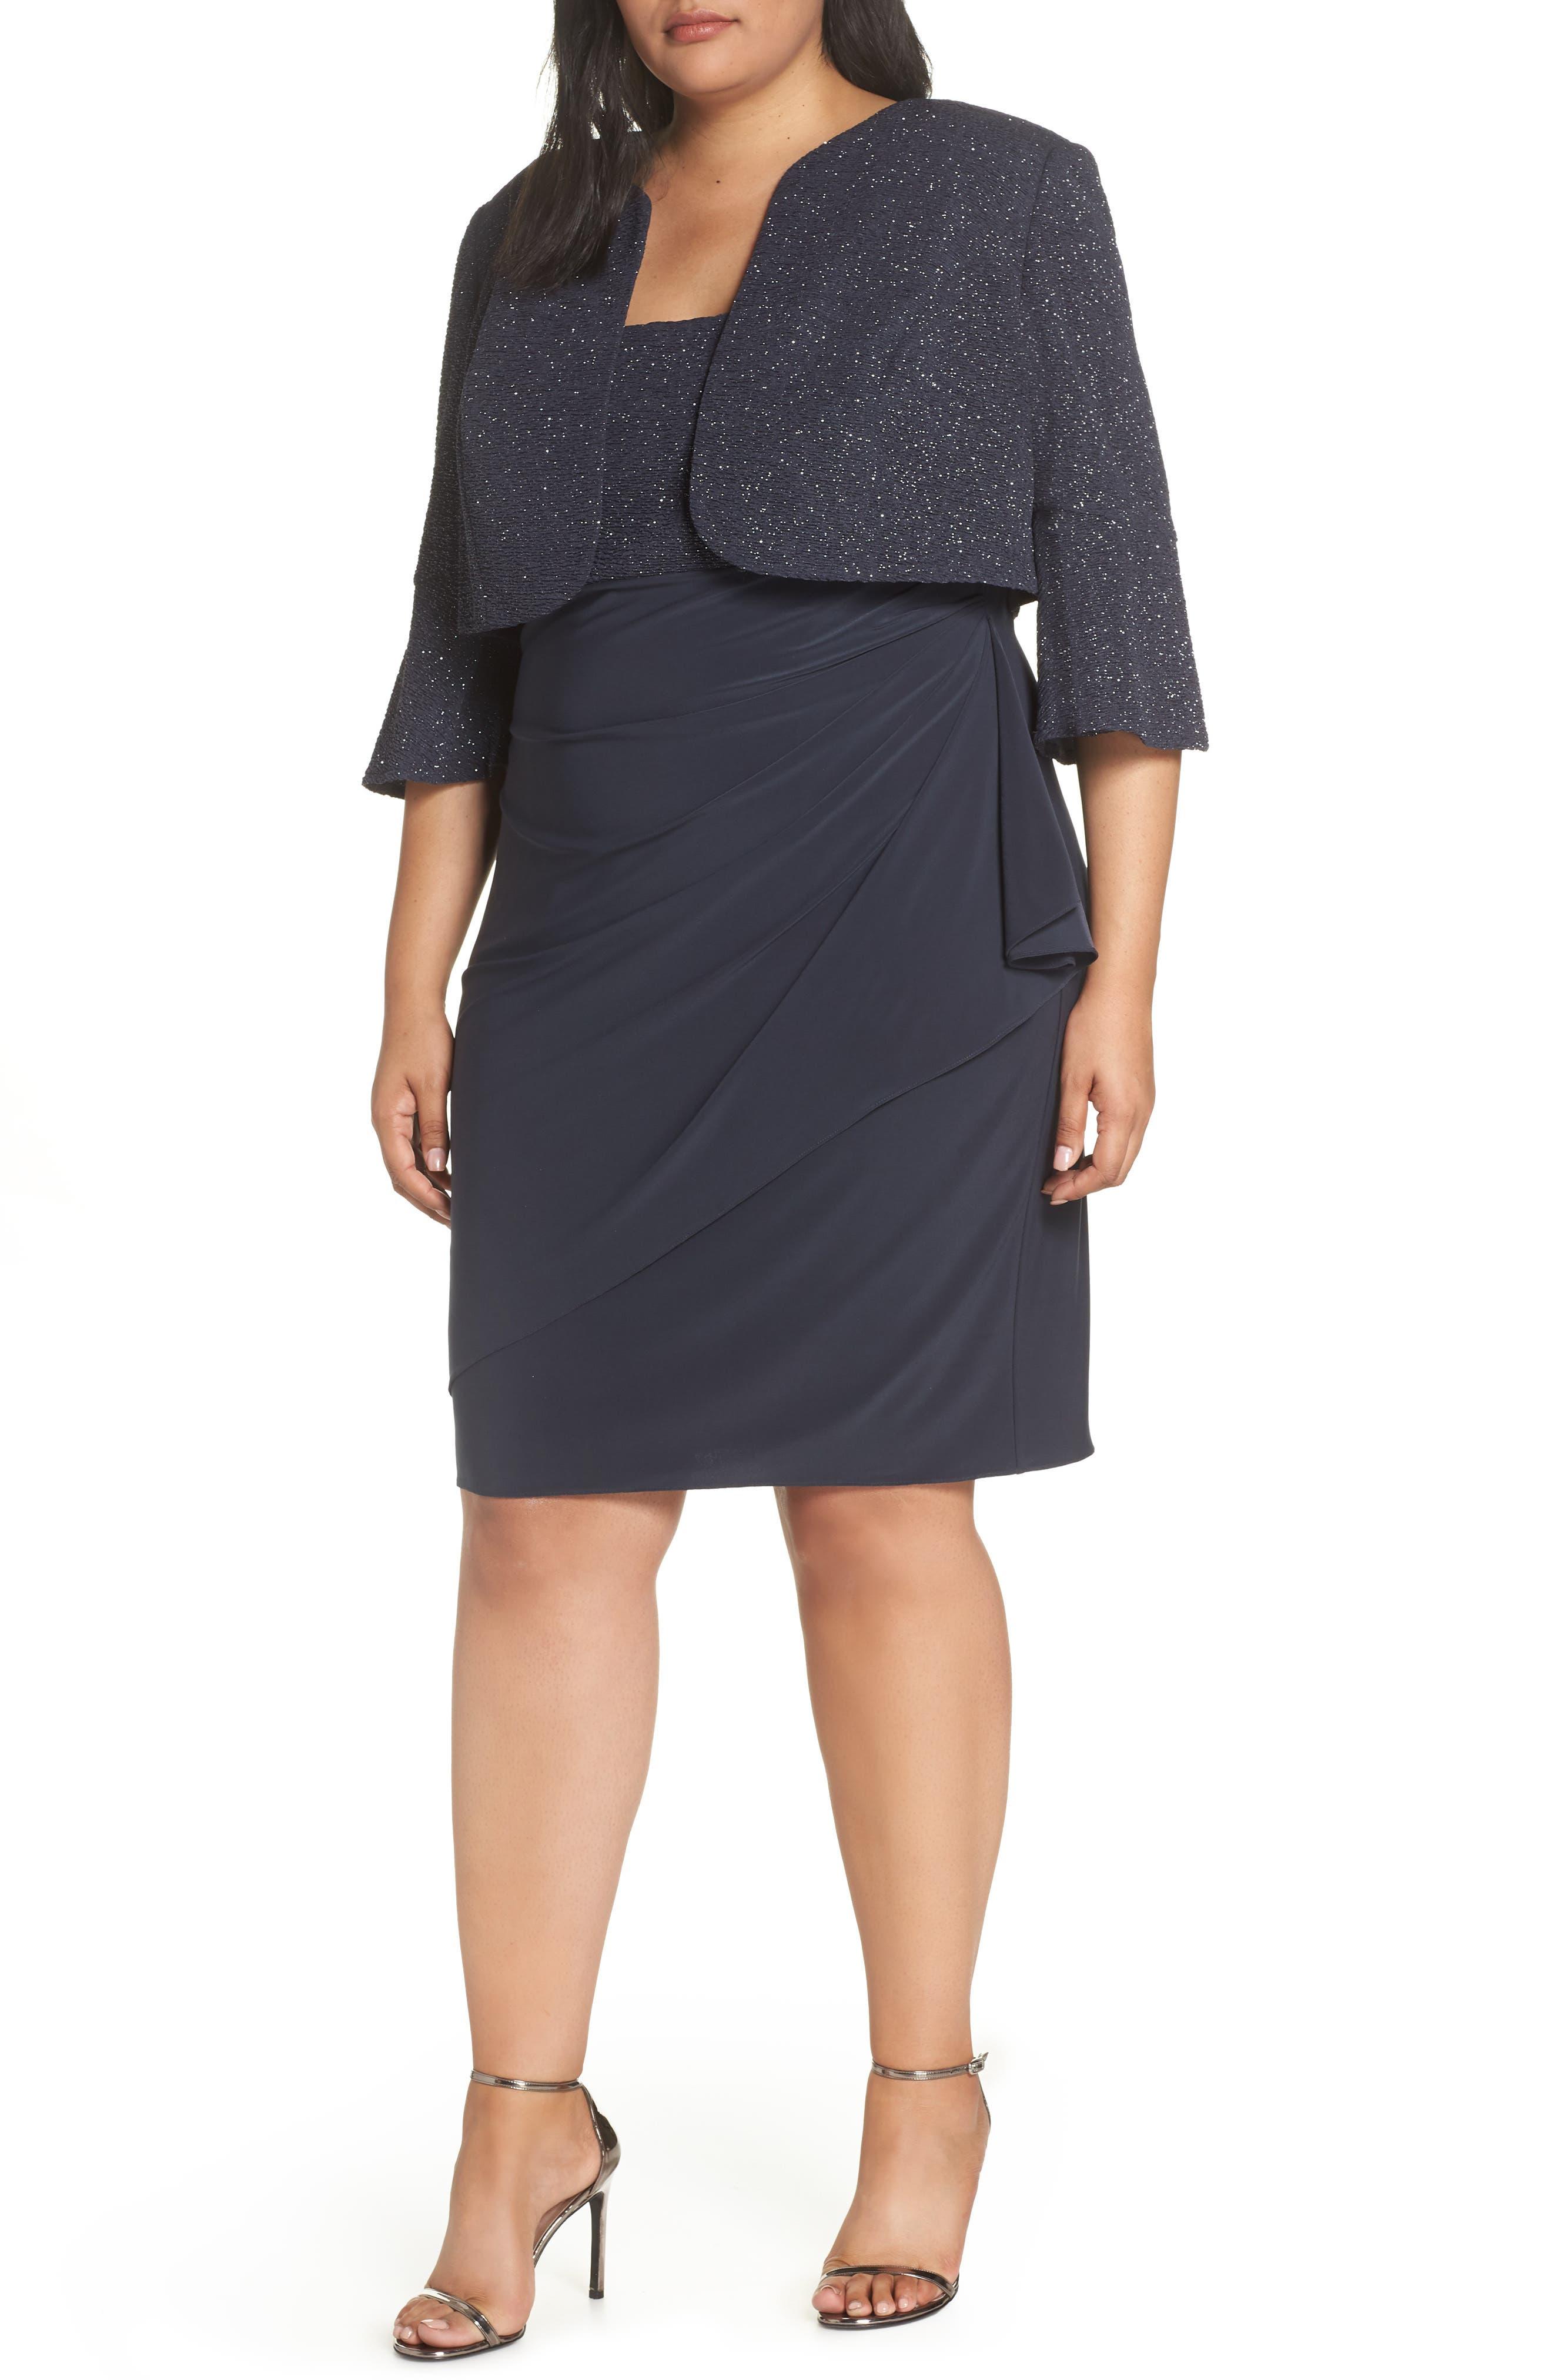 Plus Size Alex Evenings Bolero Jacket Dress, Grey